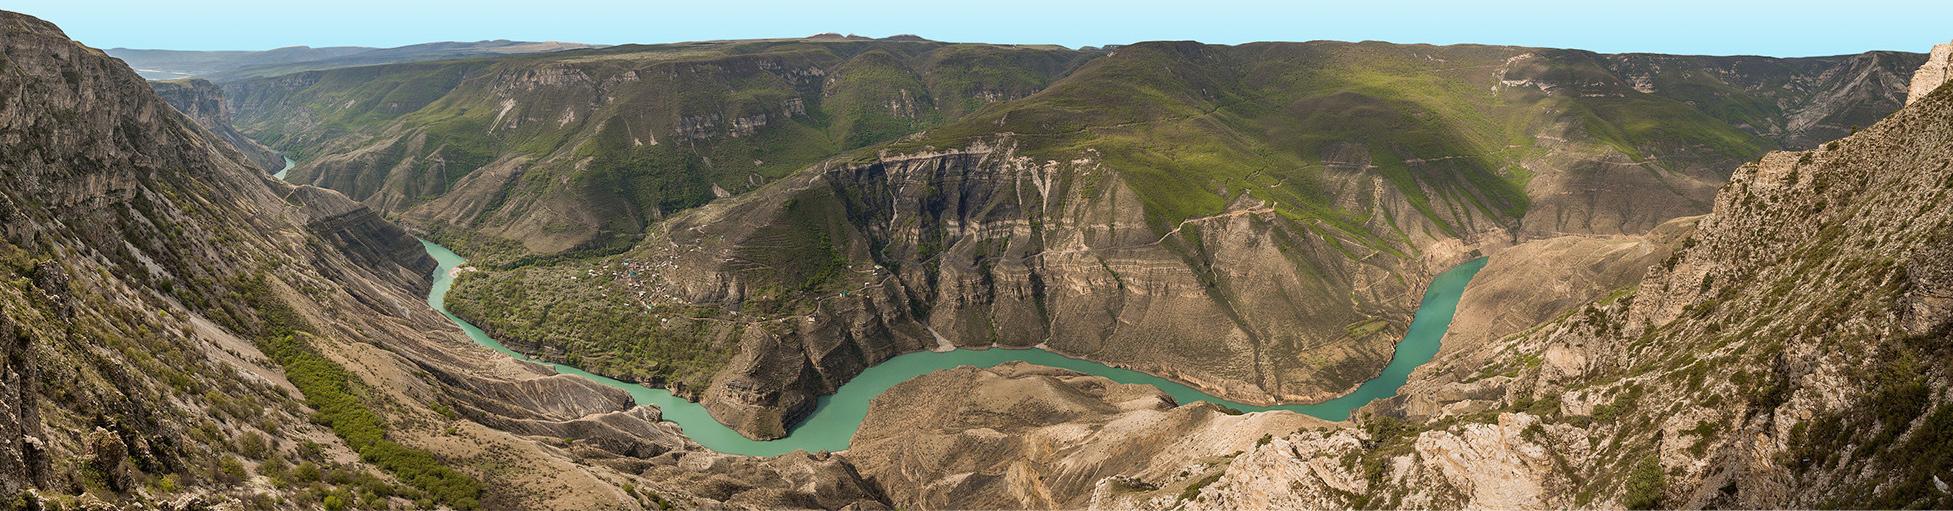 Сулакский каньон с прогулкой на катере